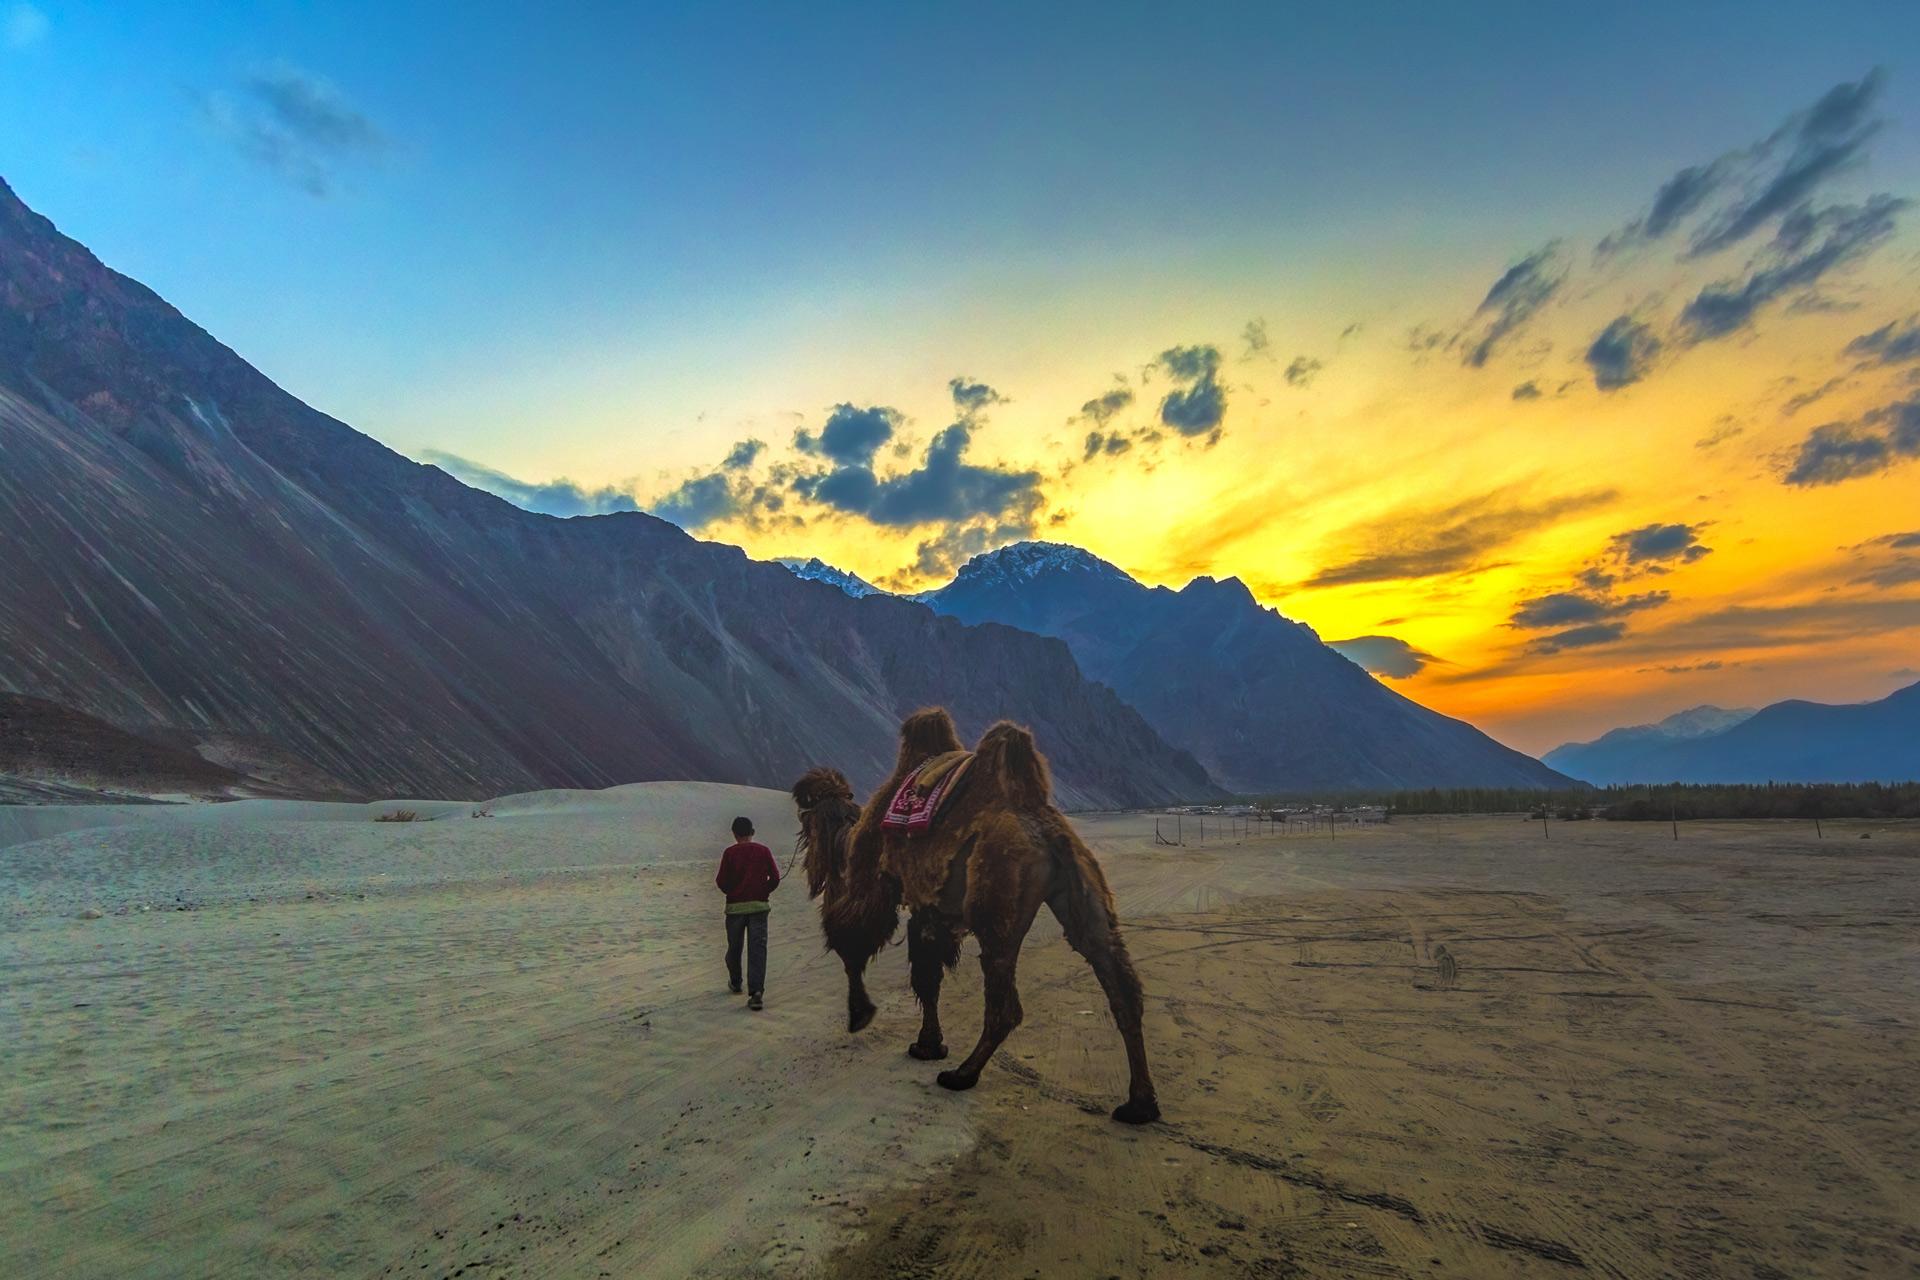 Bawray Banjaray In Ladakh